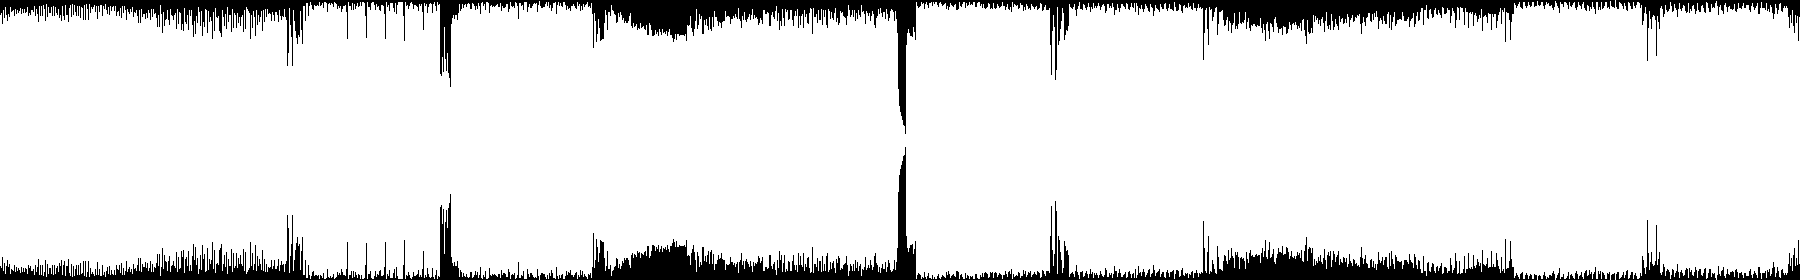 PSY audio waveform